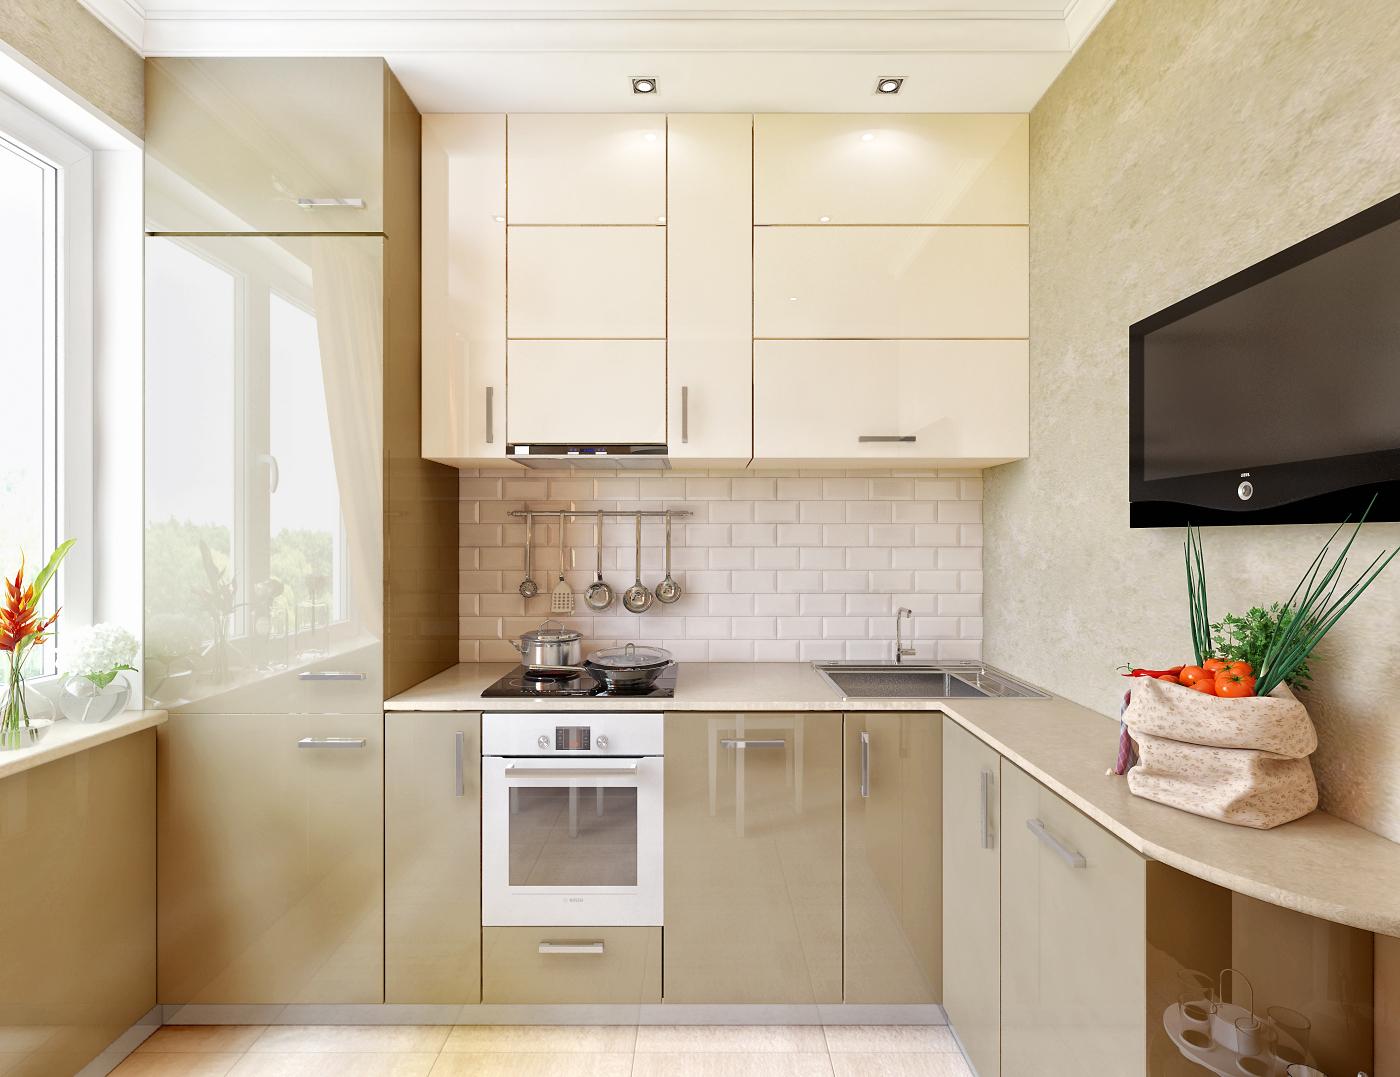 Бежевый дизайн кухни 7 кв м